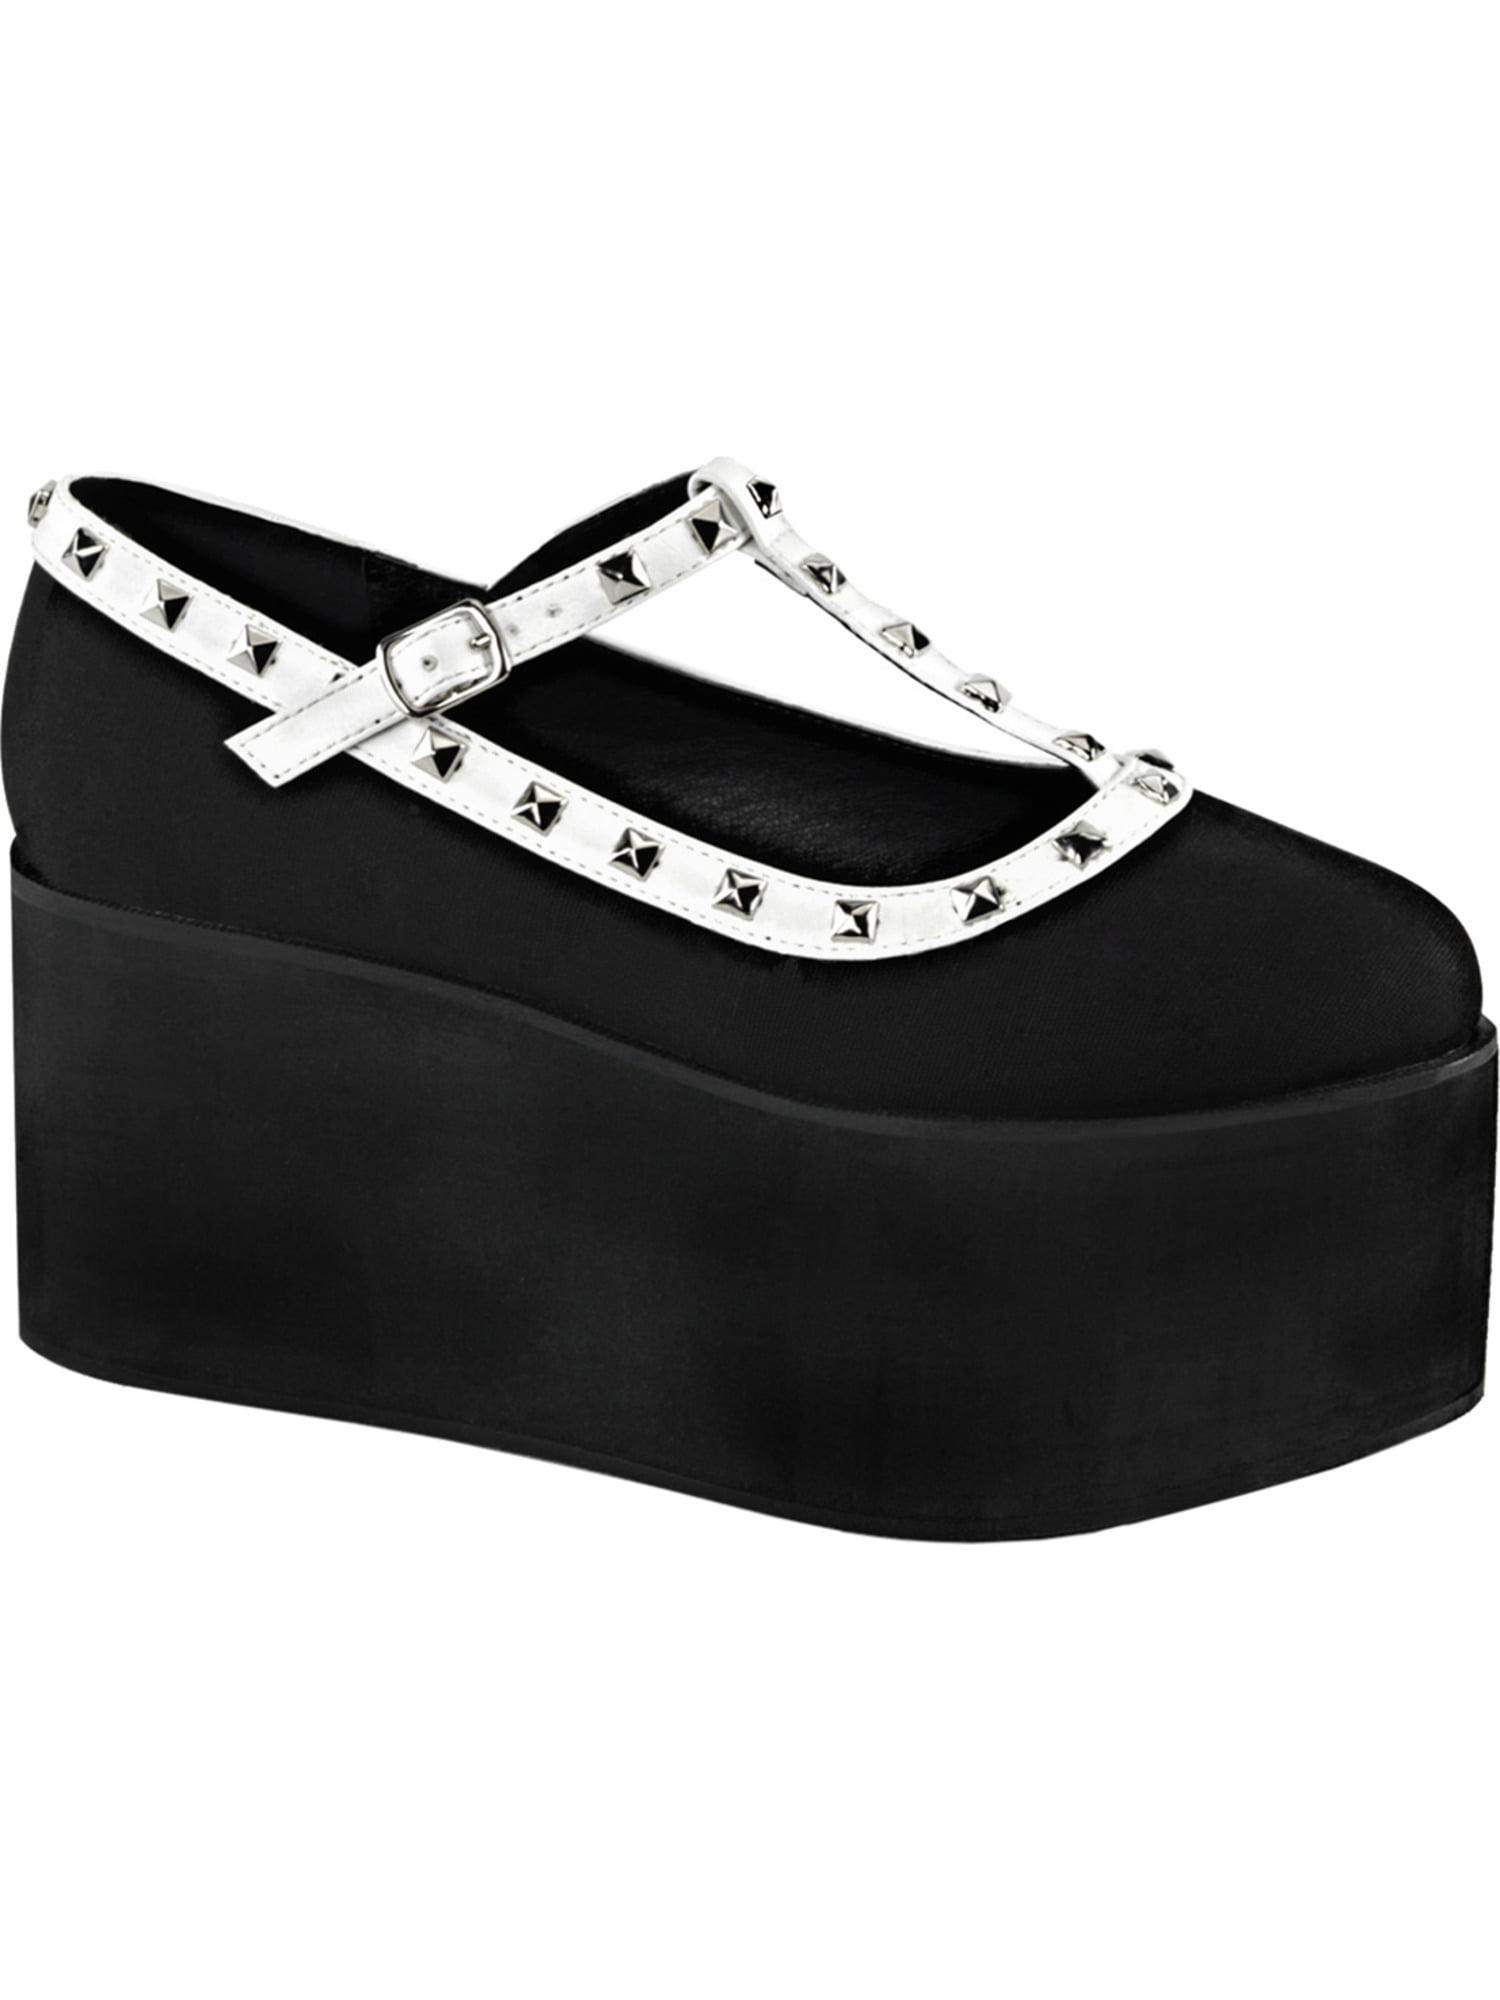 Womens T Strap Shoes Black Canvas White Vegan Leather Studs 3 1/4 Inch Platform